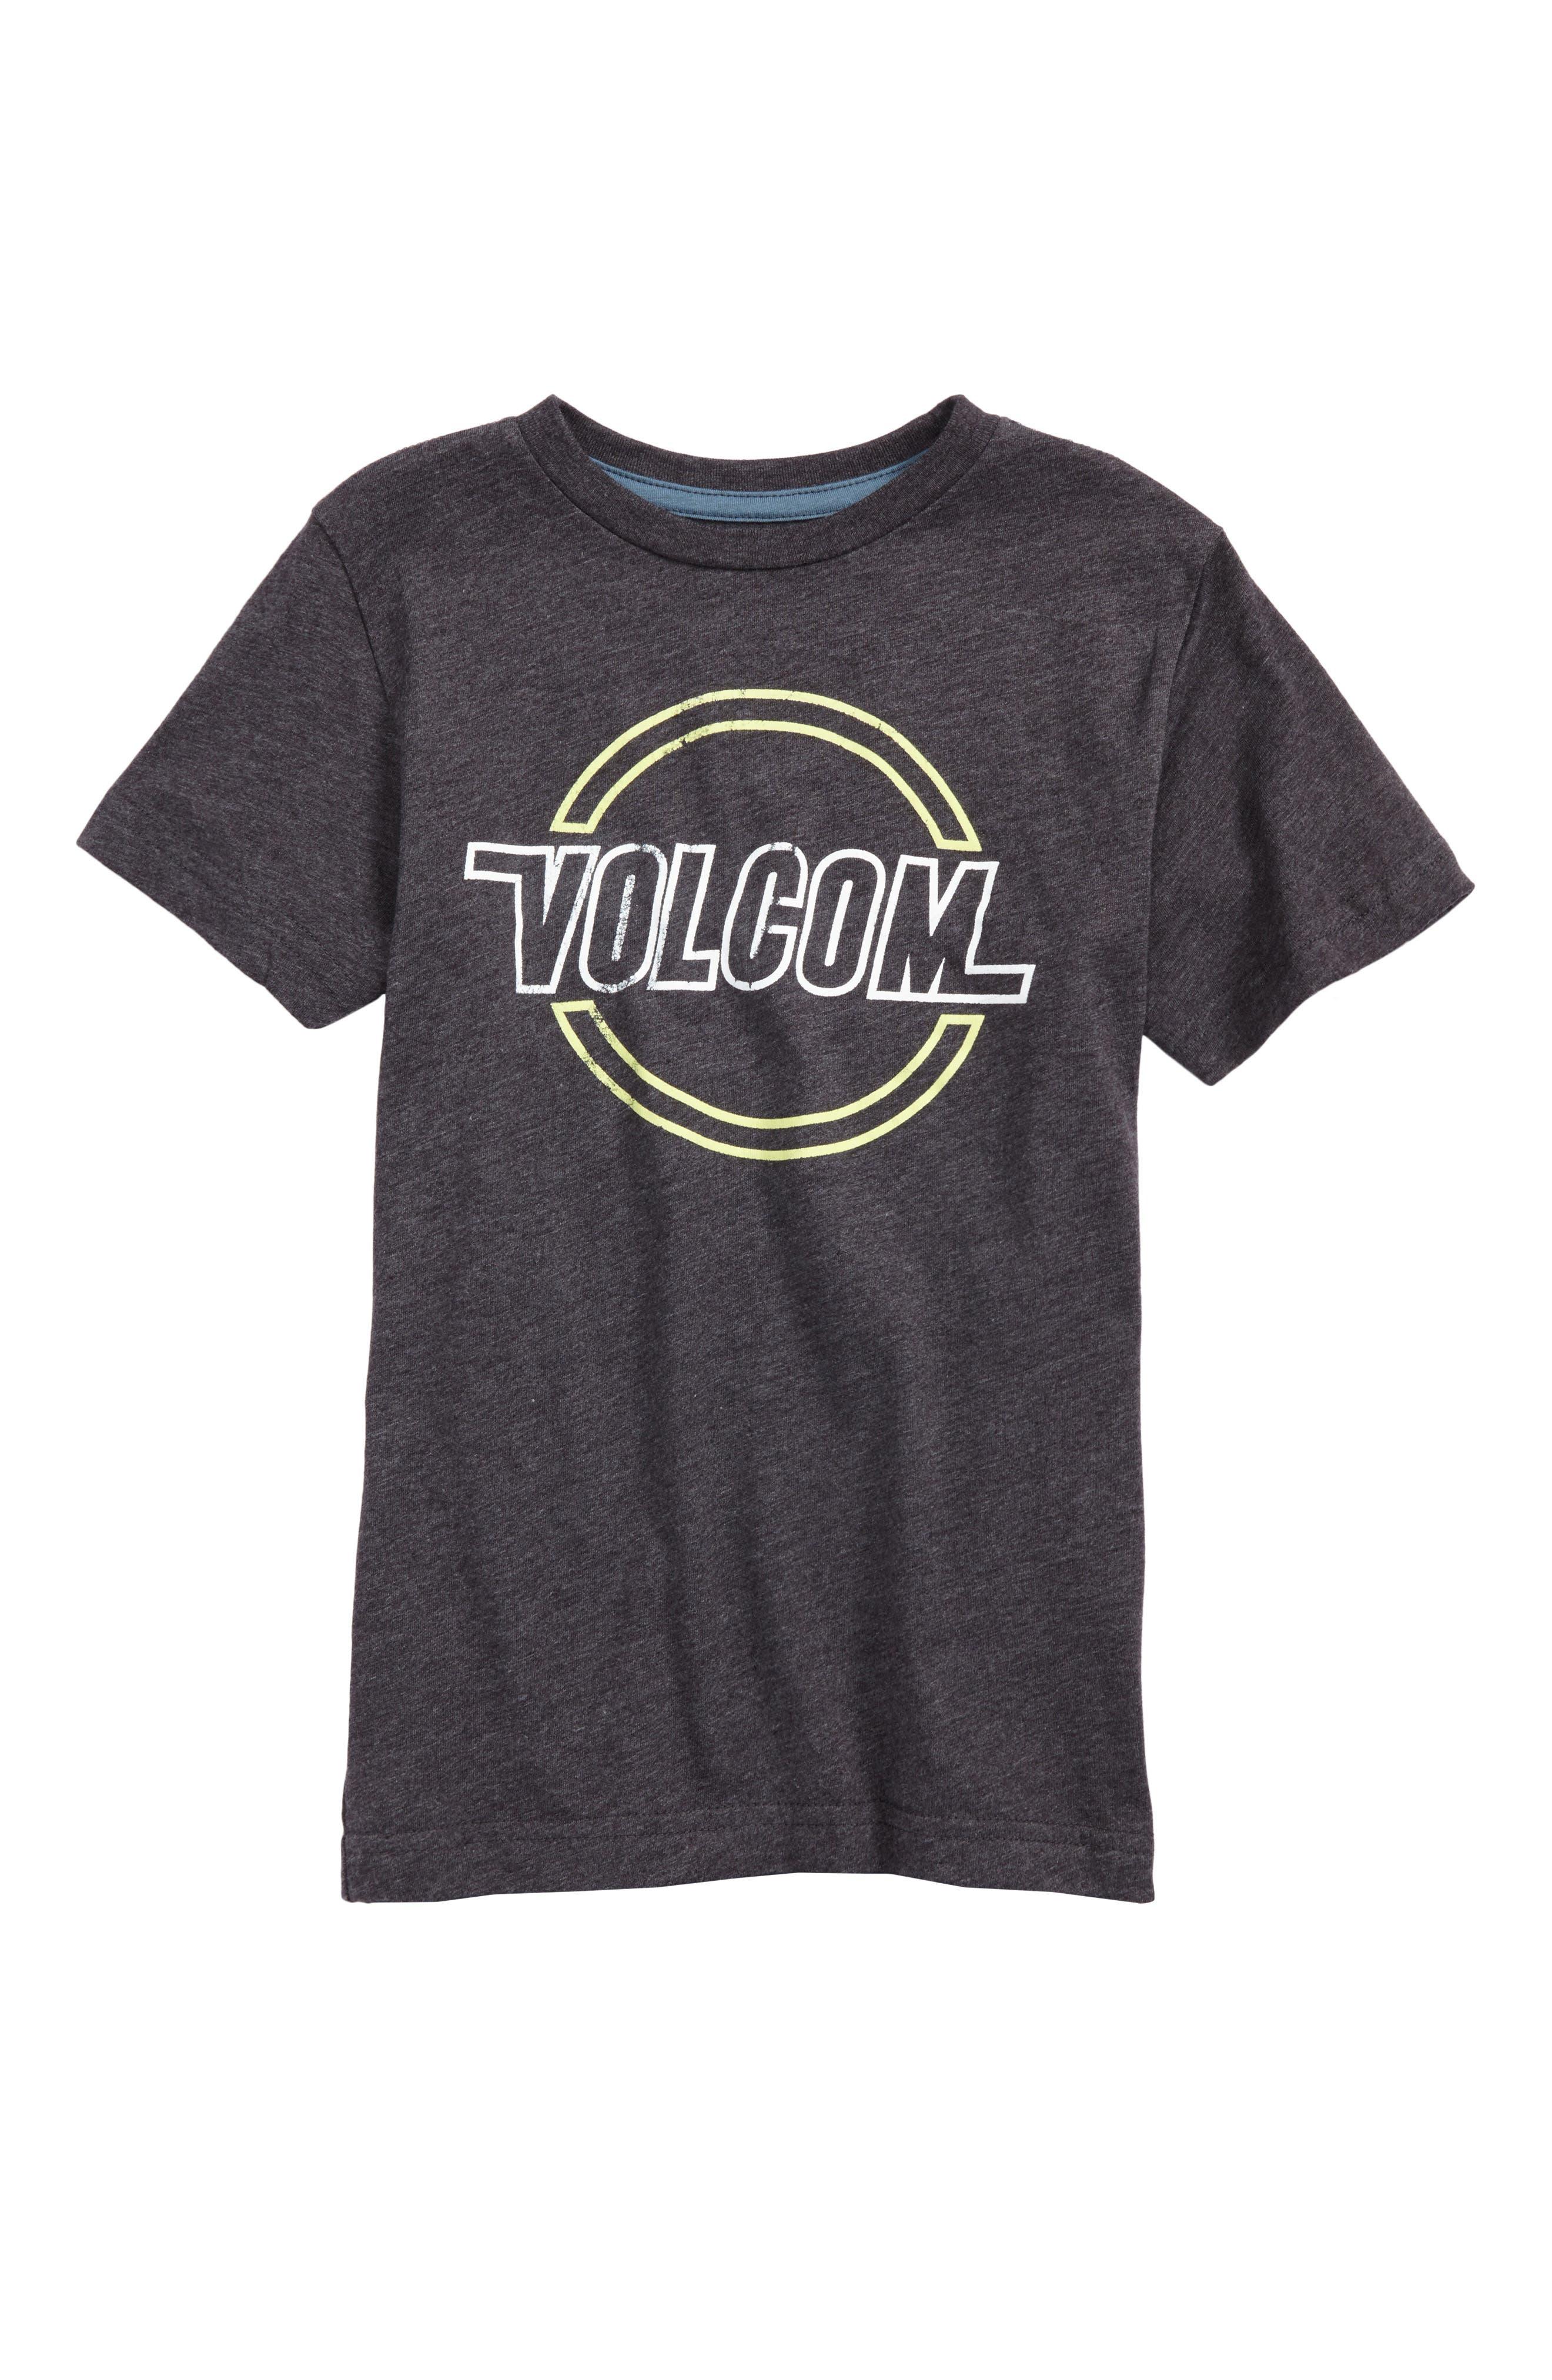 Volcom Lo-Tech Logo Graphic T-Shirt (Toddler Boys & Little Boys)